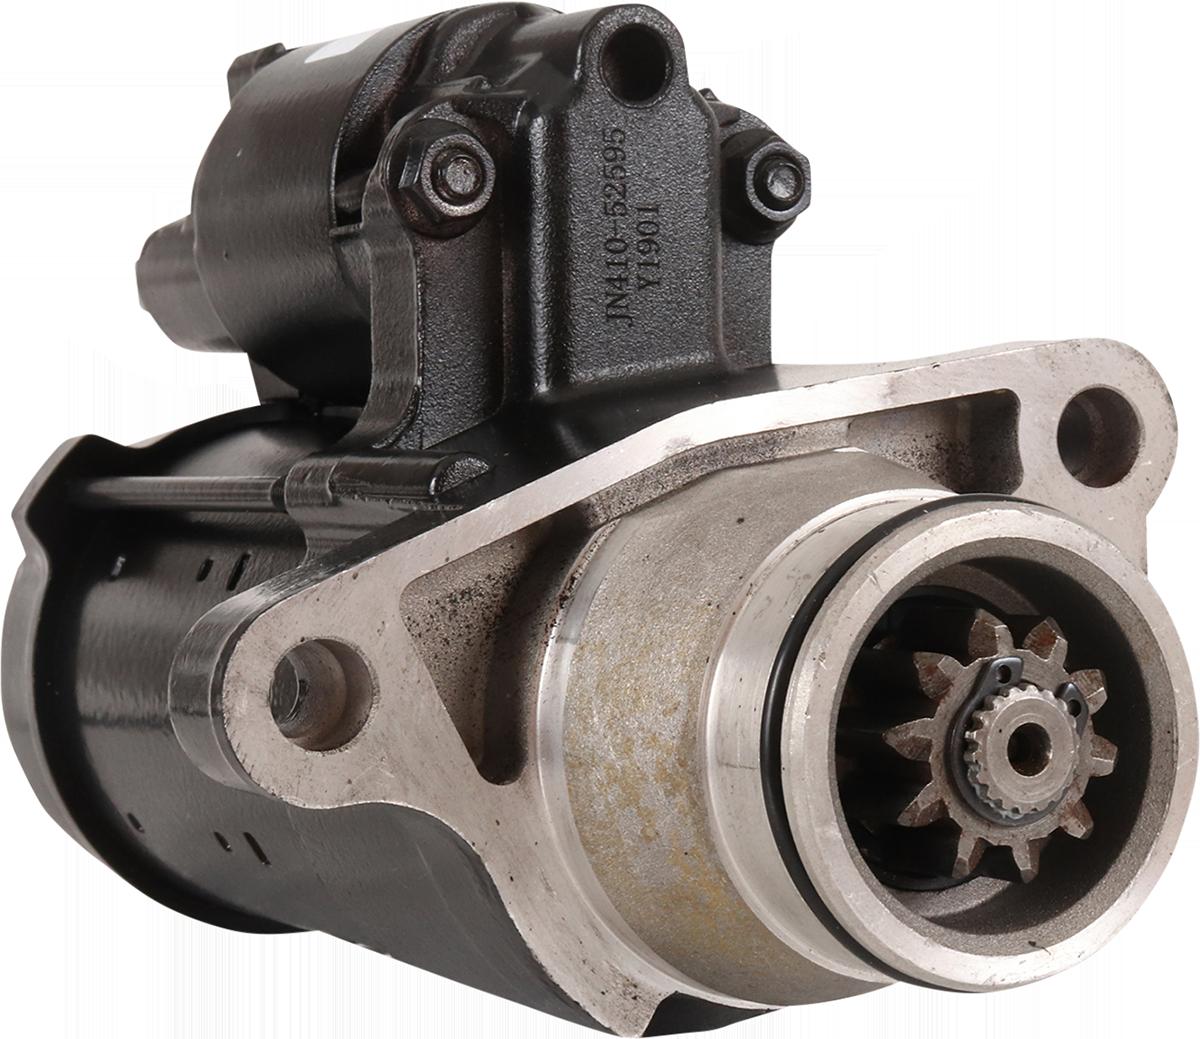 Drag Specialties 1.4kW Motorcycle Engine Starter 18-20 Harley Softail FLSL FXFB